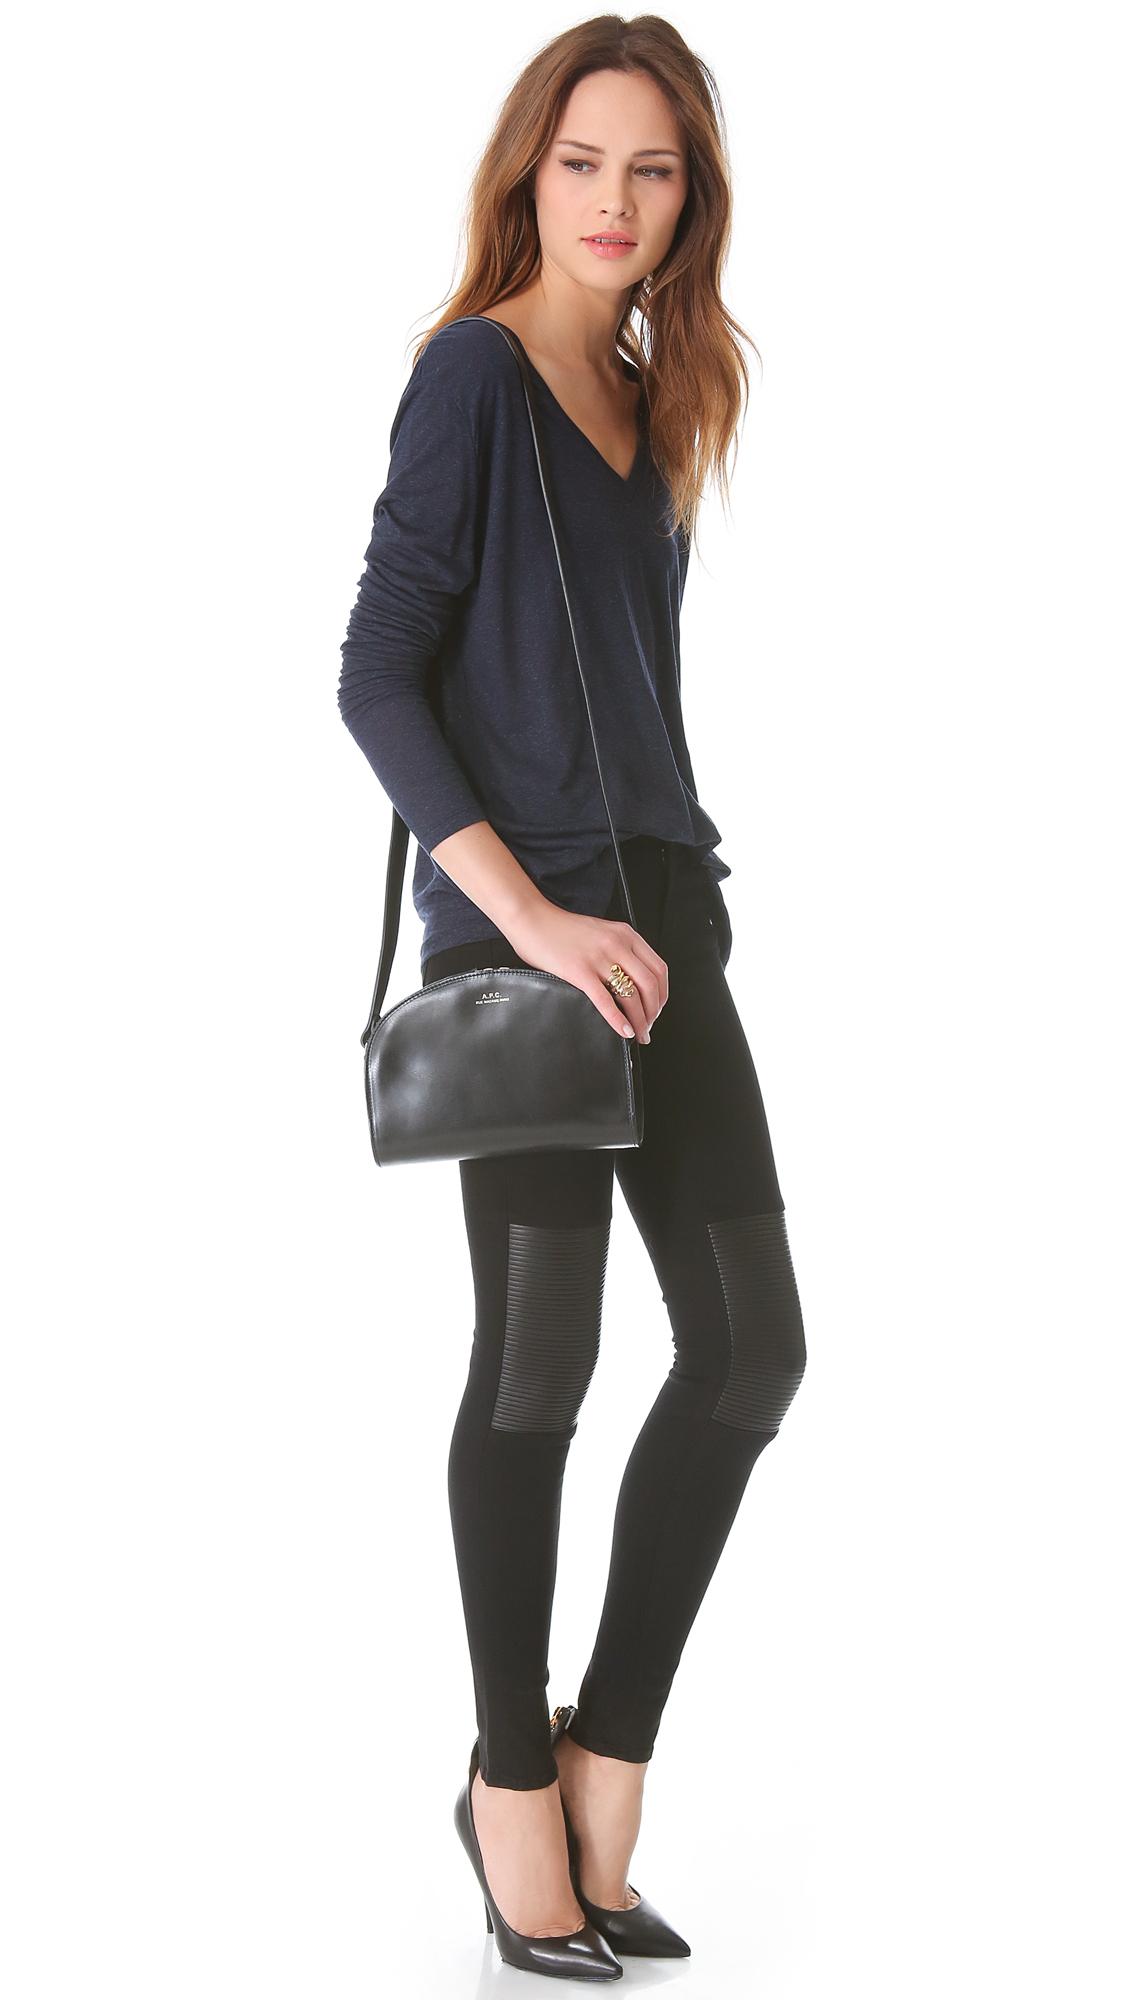 A.p.c. Sac Demi Lune Bag En Ligne Finishline Acheter La Vente En Ligne La Sortie En Vogue DpKUgkNk